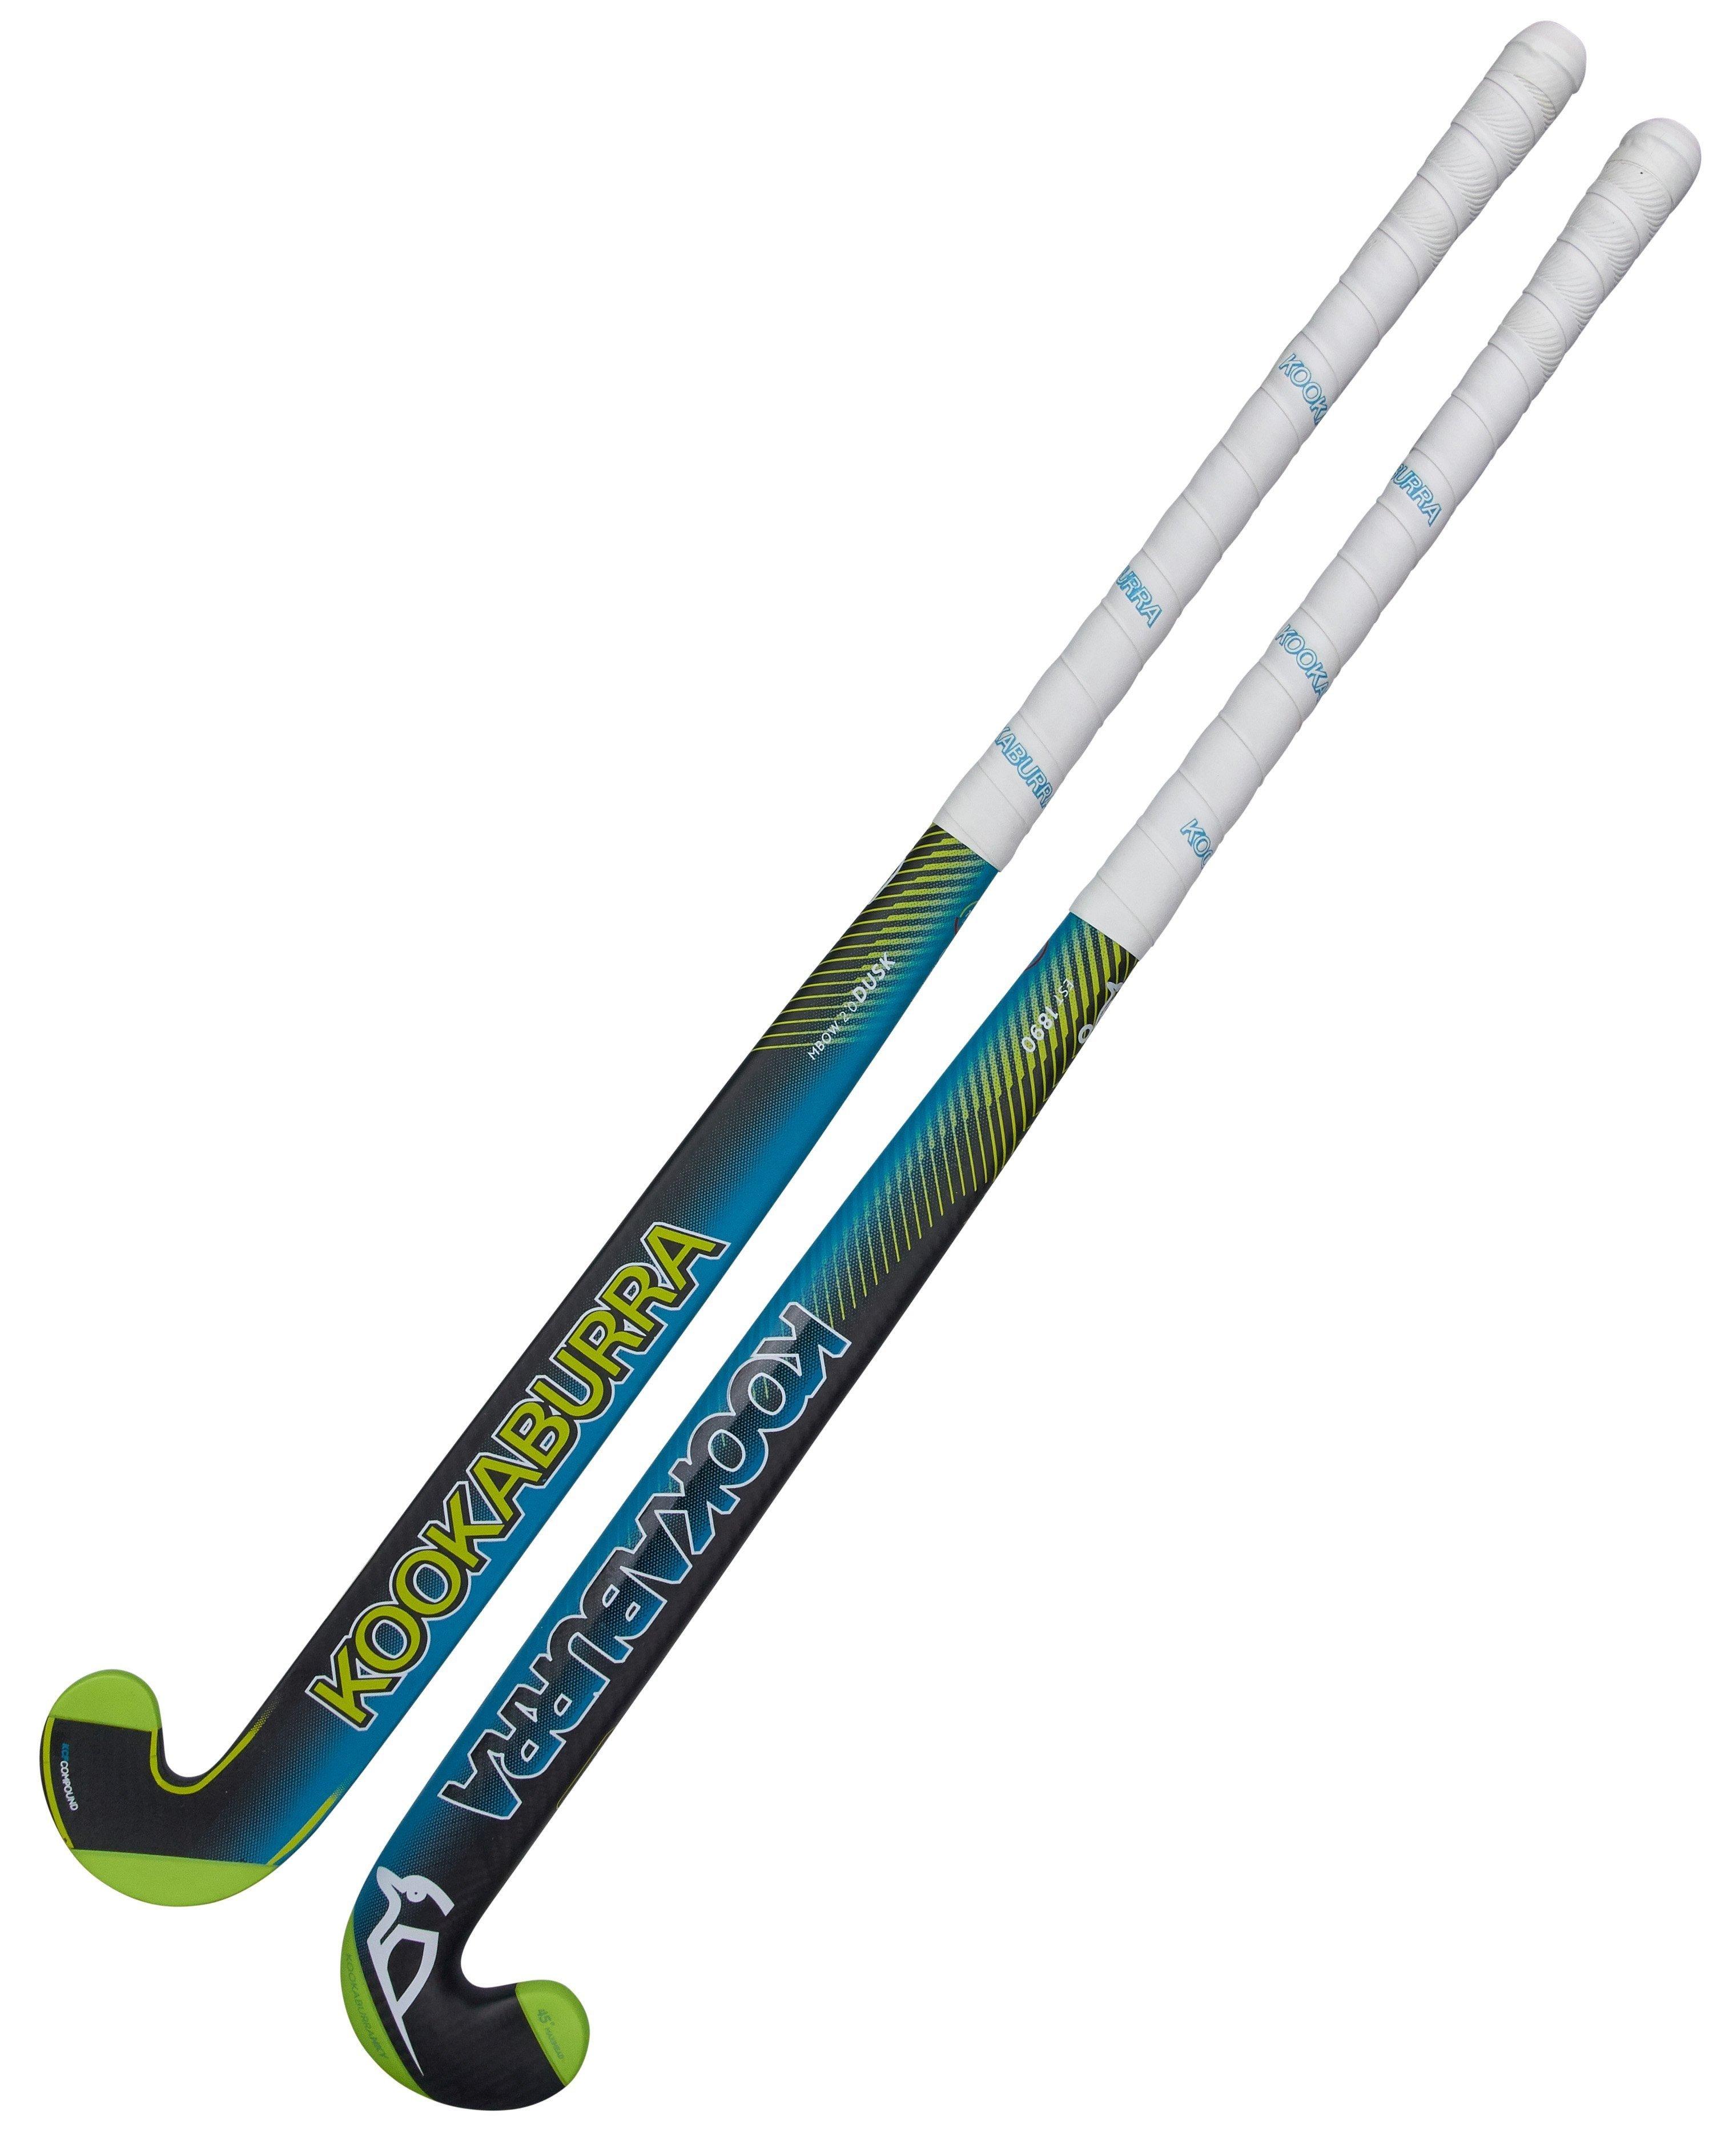 2017/18 Kookaburra Dusk - Mbow 2.0 Hockey Stick